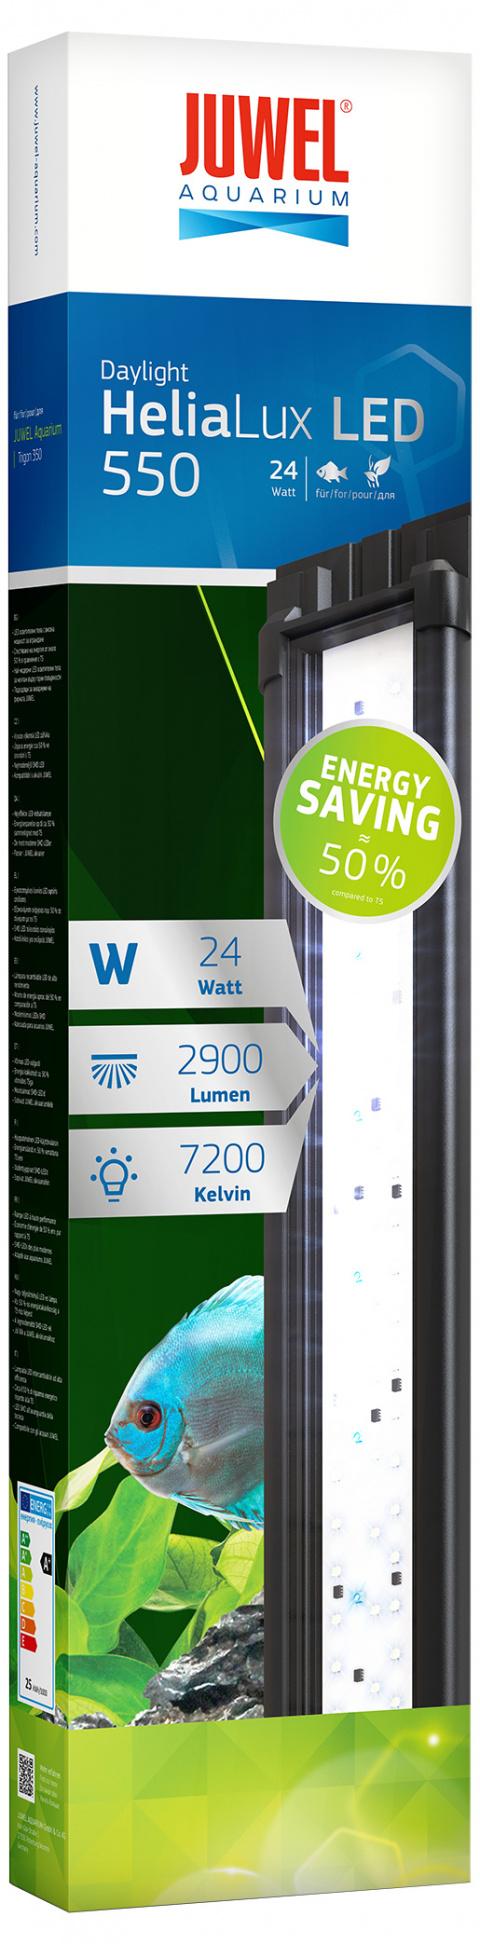 Dienas gaisma akvārijam - Juwel Helia Lux LED 550, 24 W